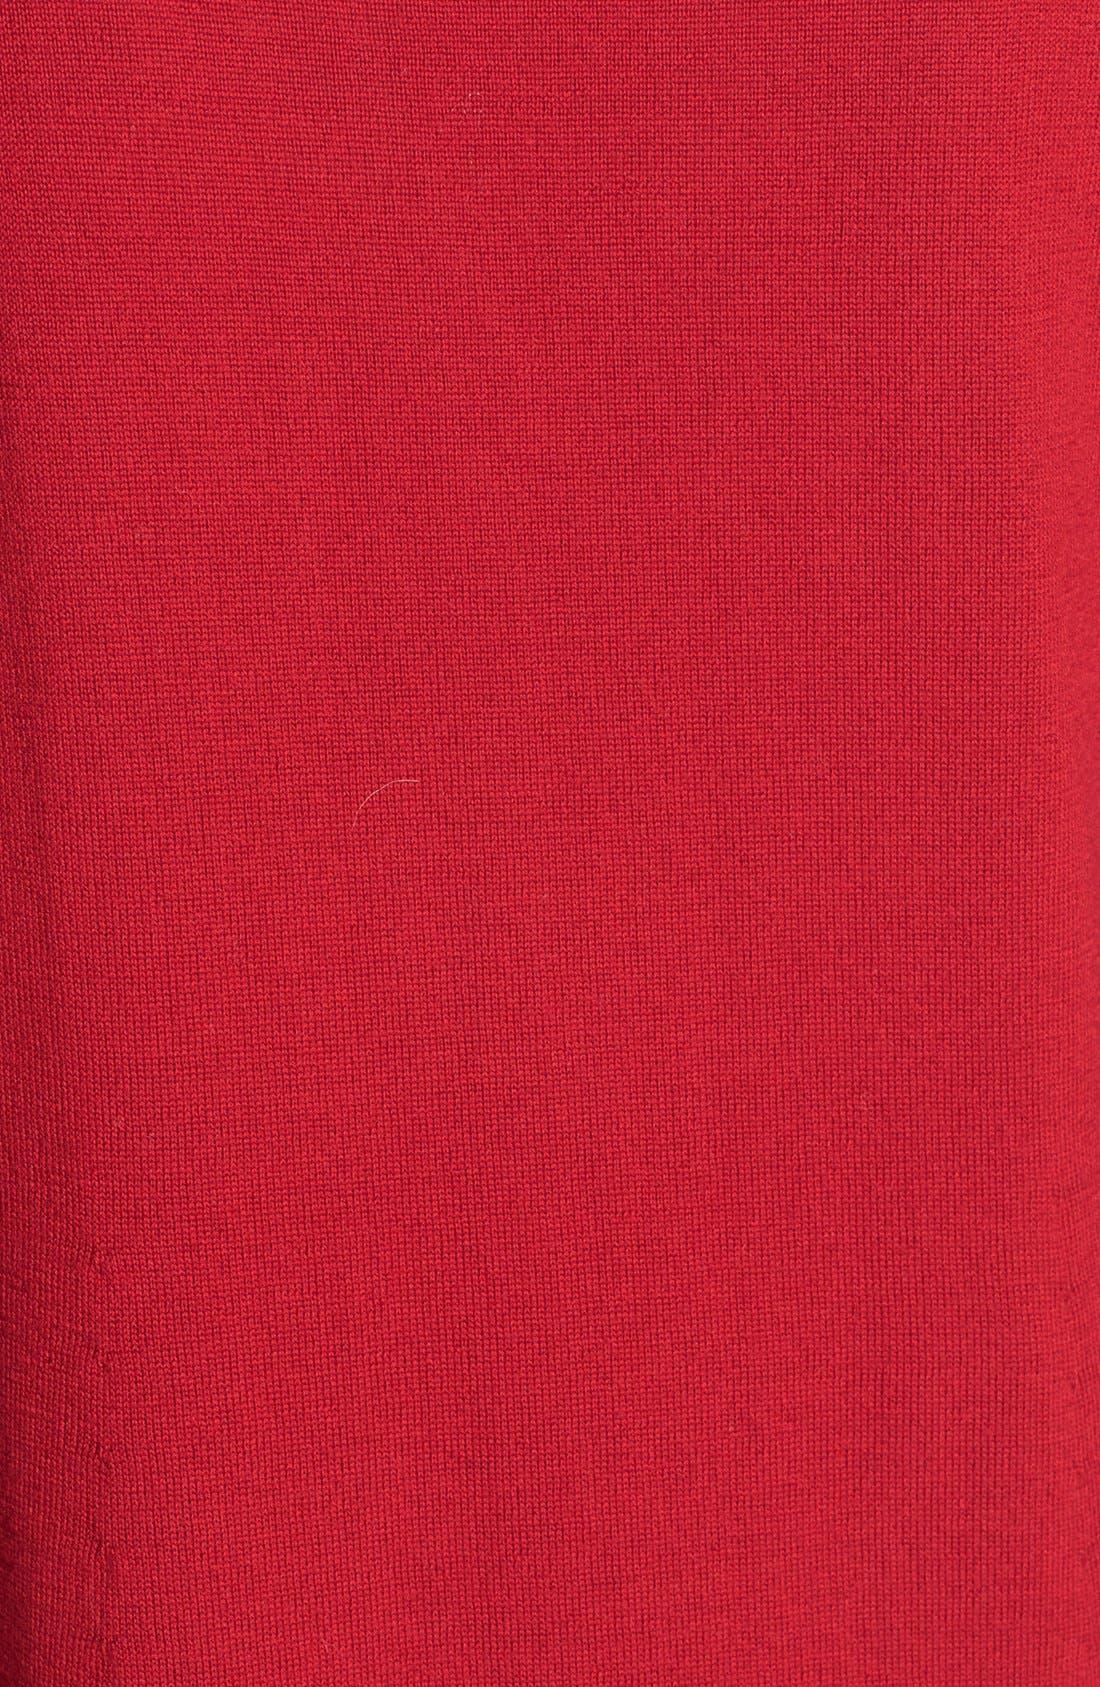 Lightweight Merino Jersey V-Neck Tunic,                             Alternate thumbnail 69, color,